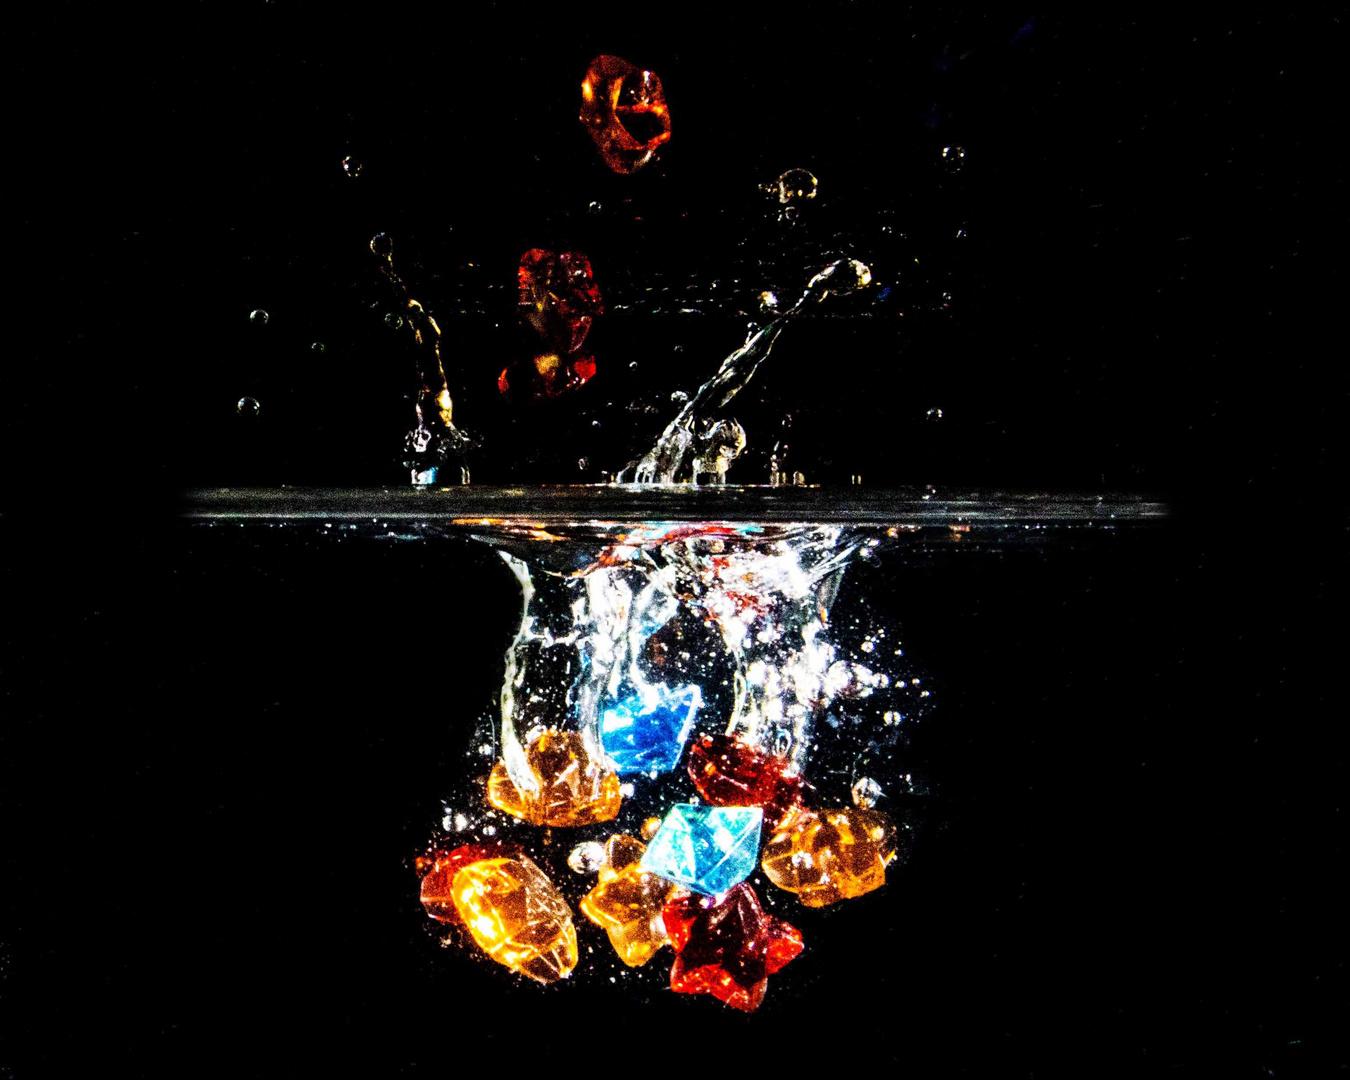 Splash Sterne